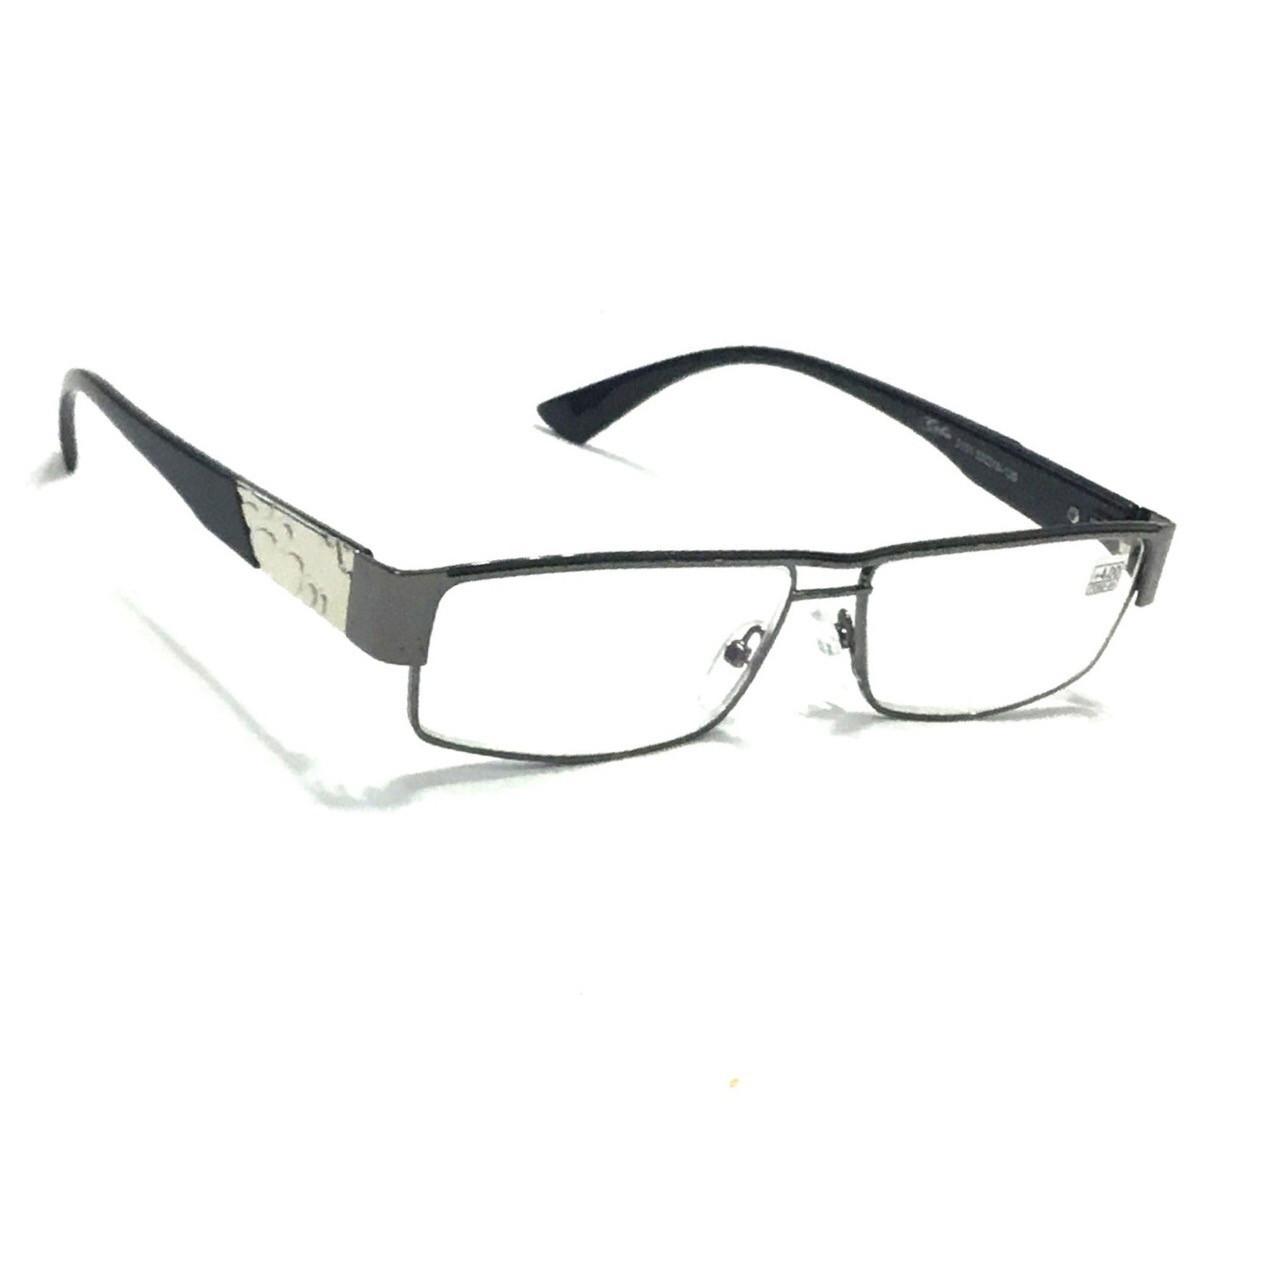 Мужские очки в металлической оправе